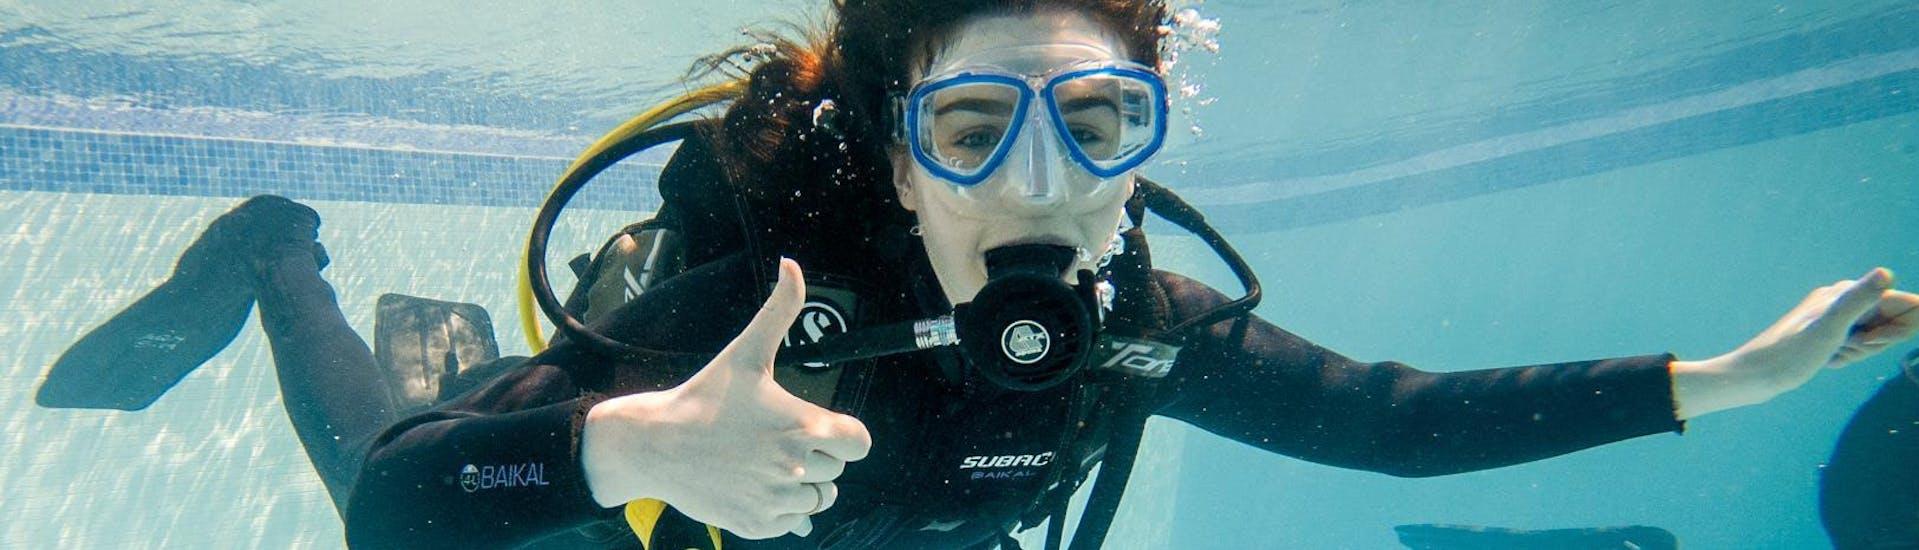 scuba-diving-course-for-beginners-padi-scuba-diver-aqua-marine-diving-tenerife-hero